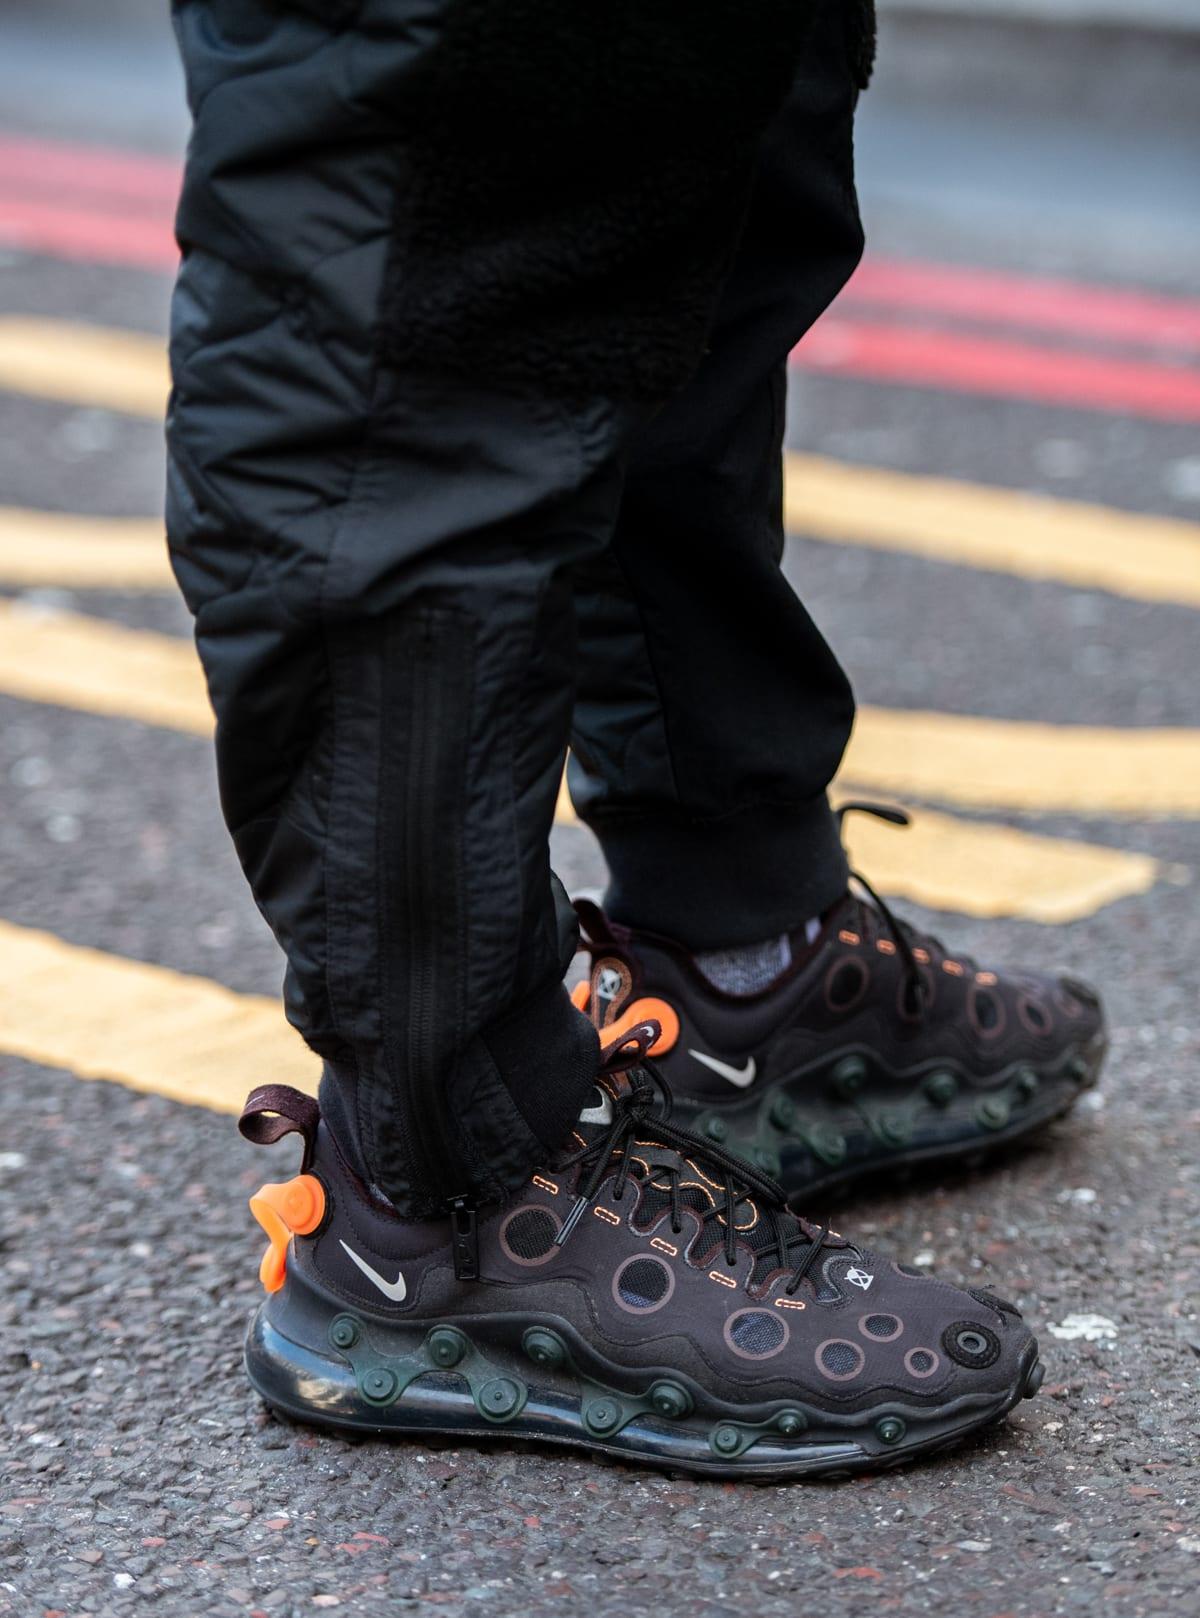 Nike Air Max 720 ISPA at London Men's Fashion Week AW20